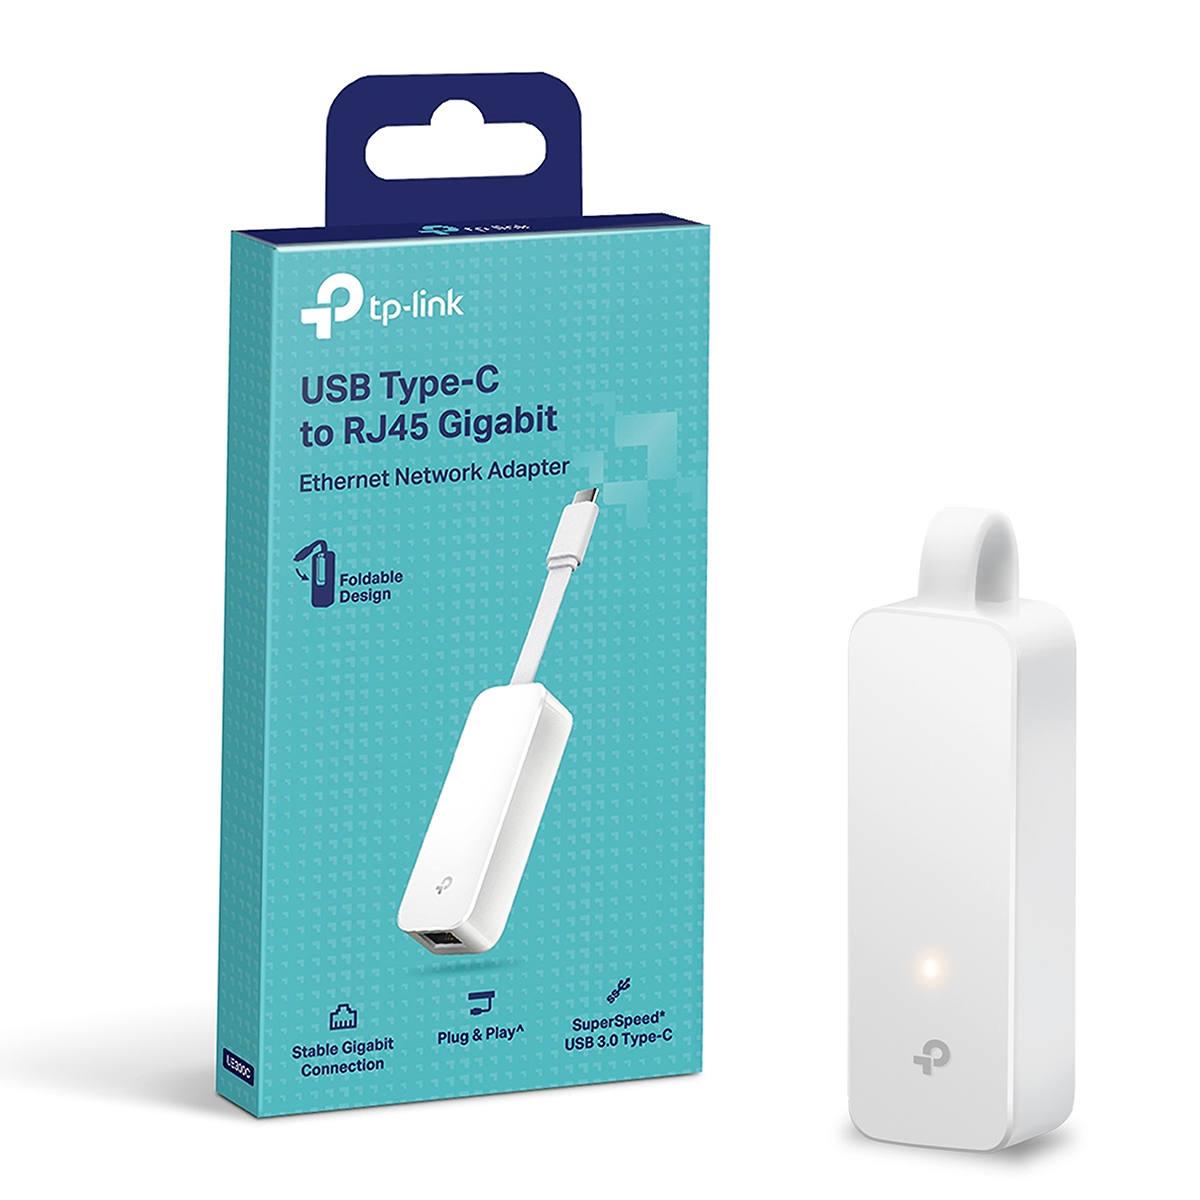 Adaptador de Rede USB Tipo C para RJ45 Ethernet Gigabit 10/100/1000 Mbps TP-Link UE300C